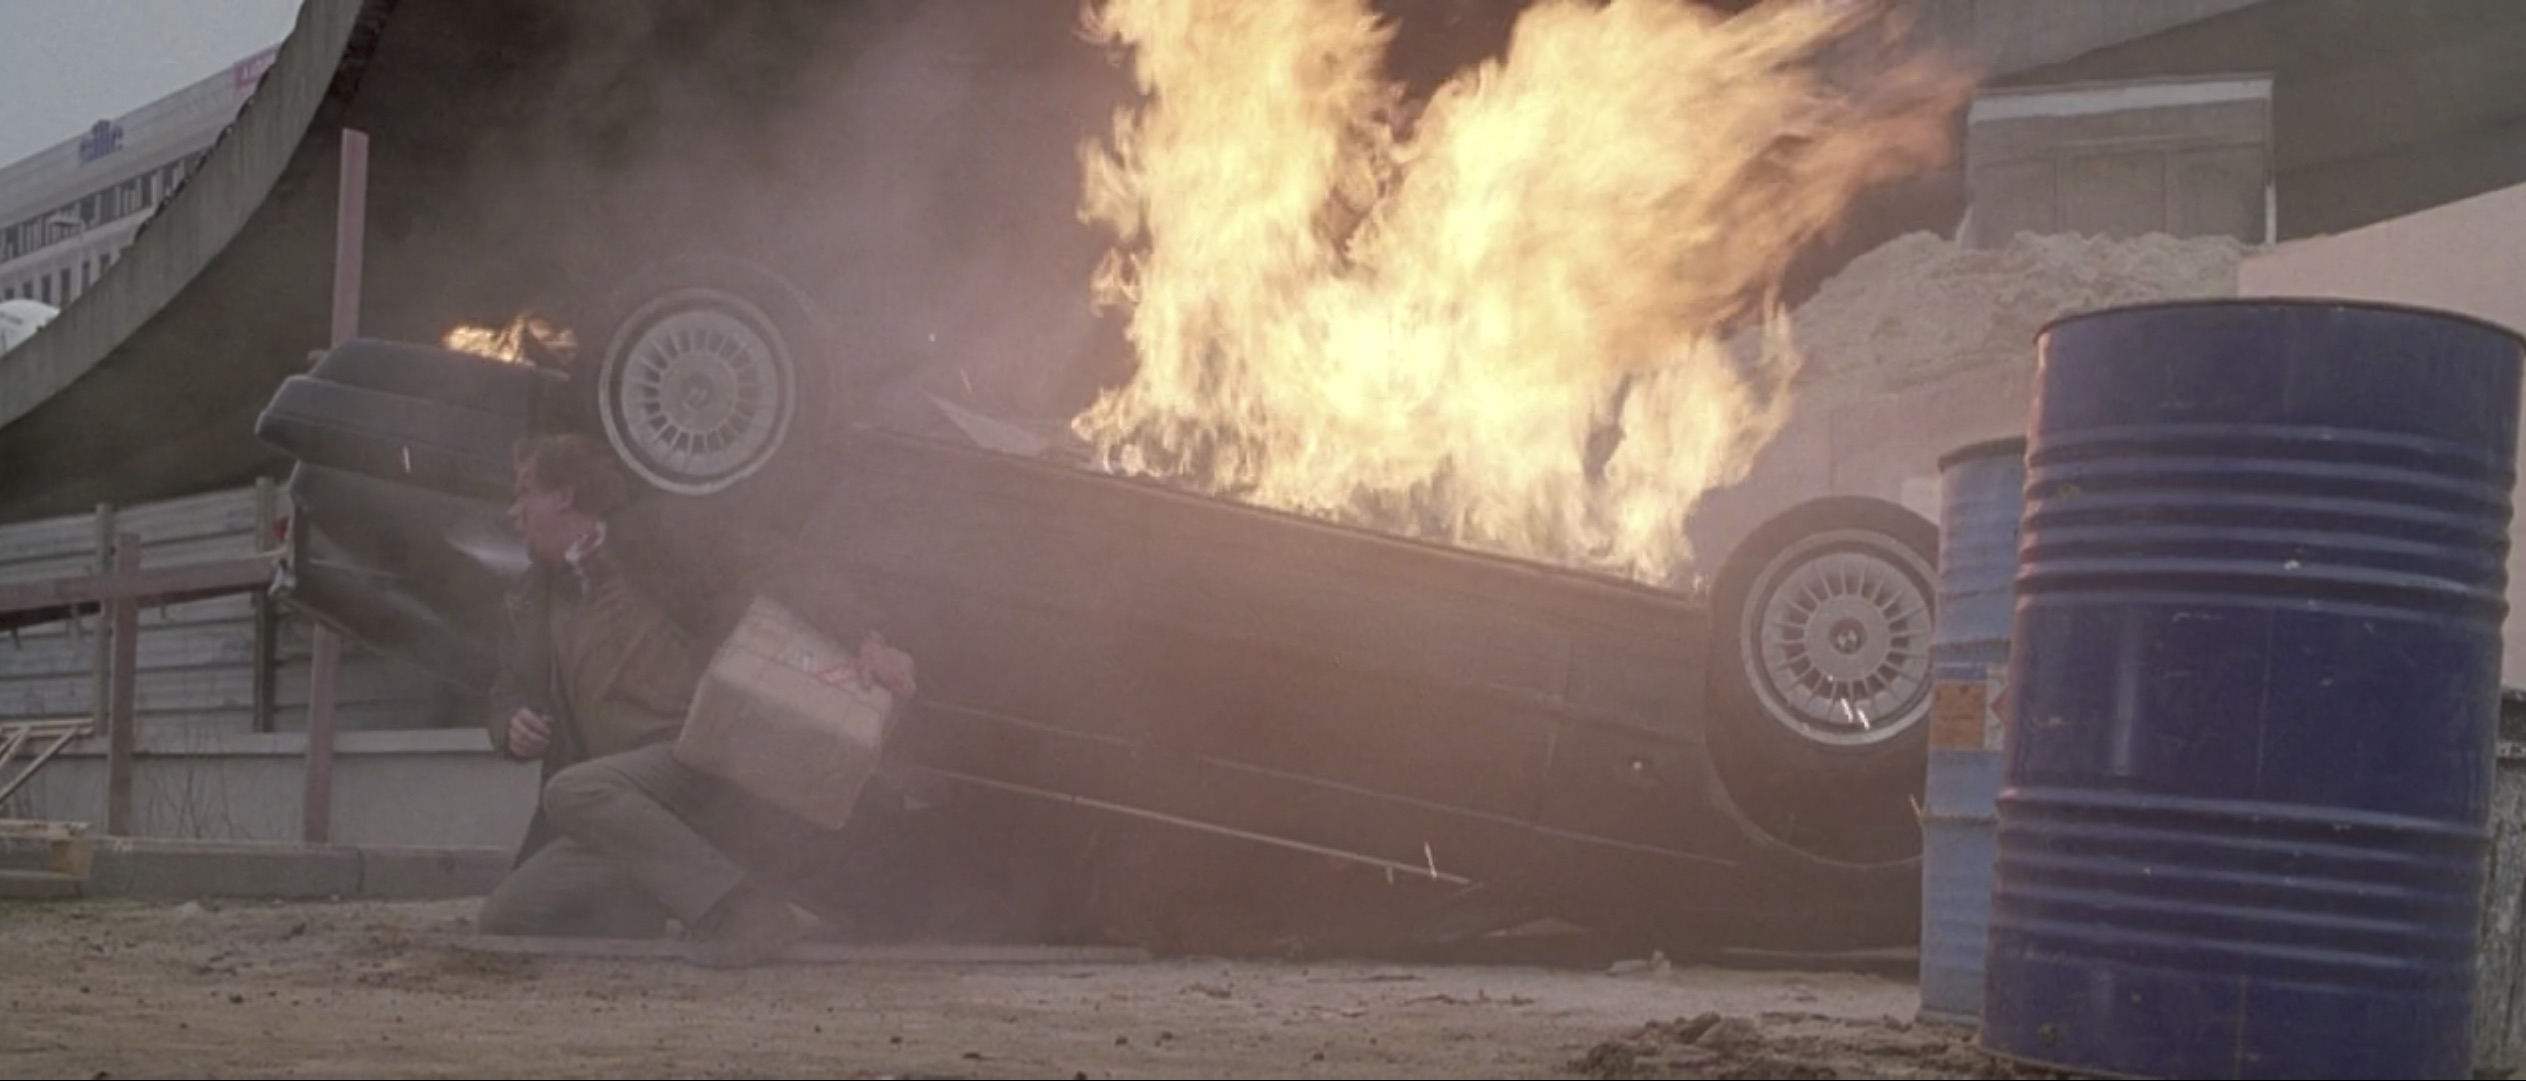 Ronin car on fire